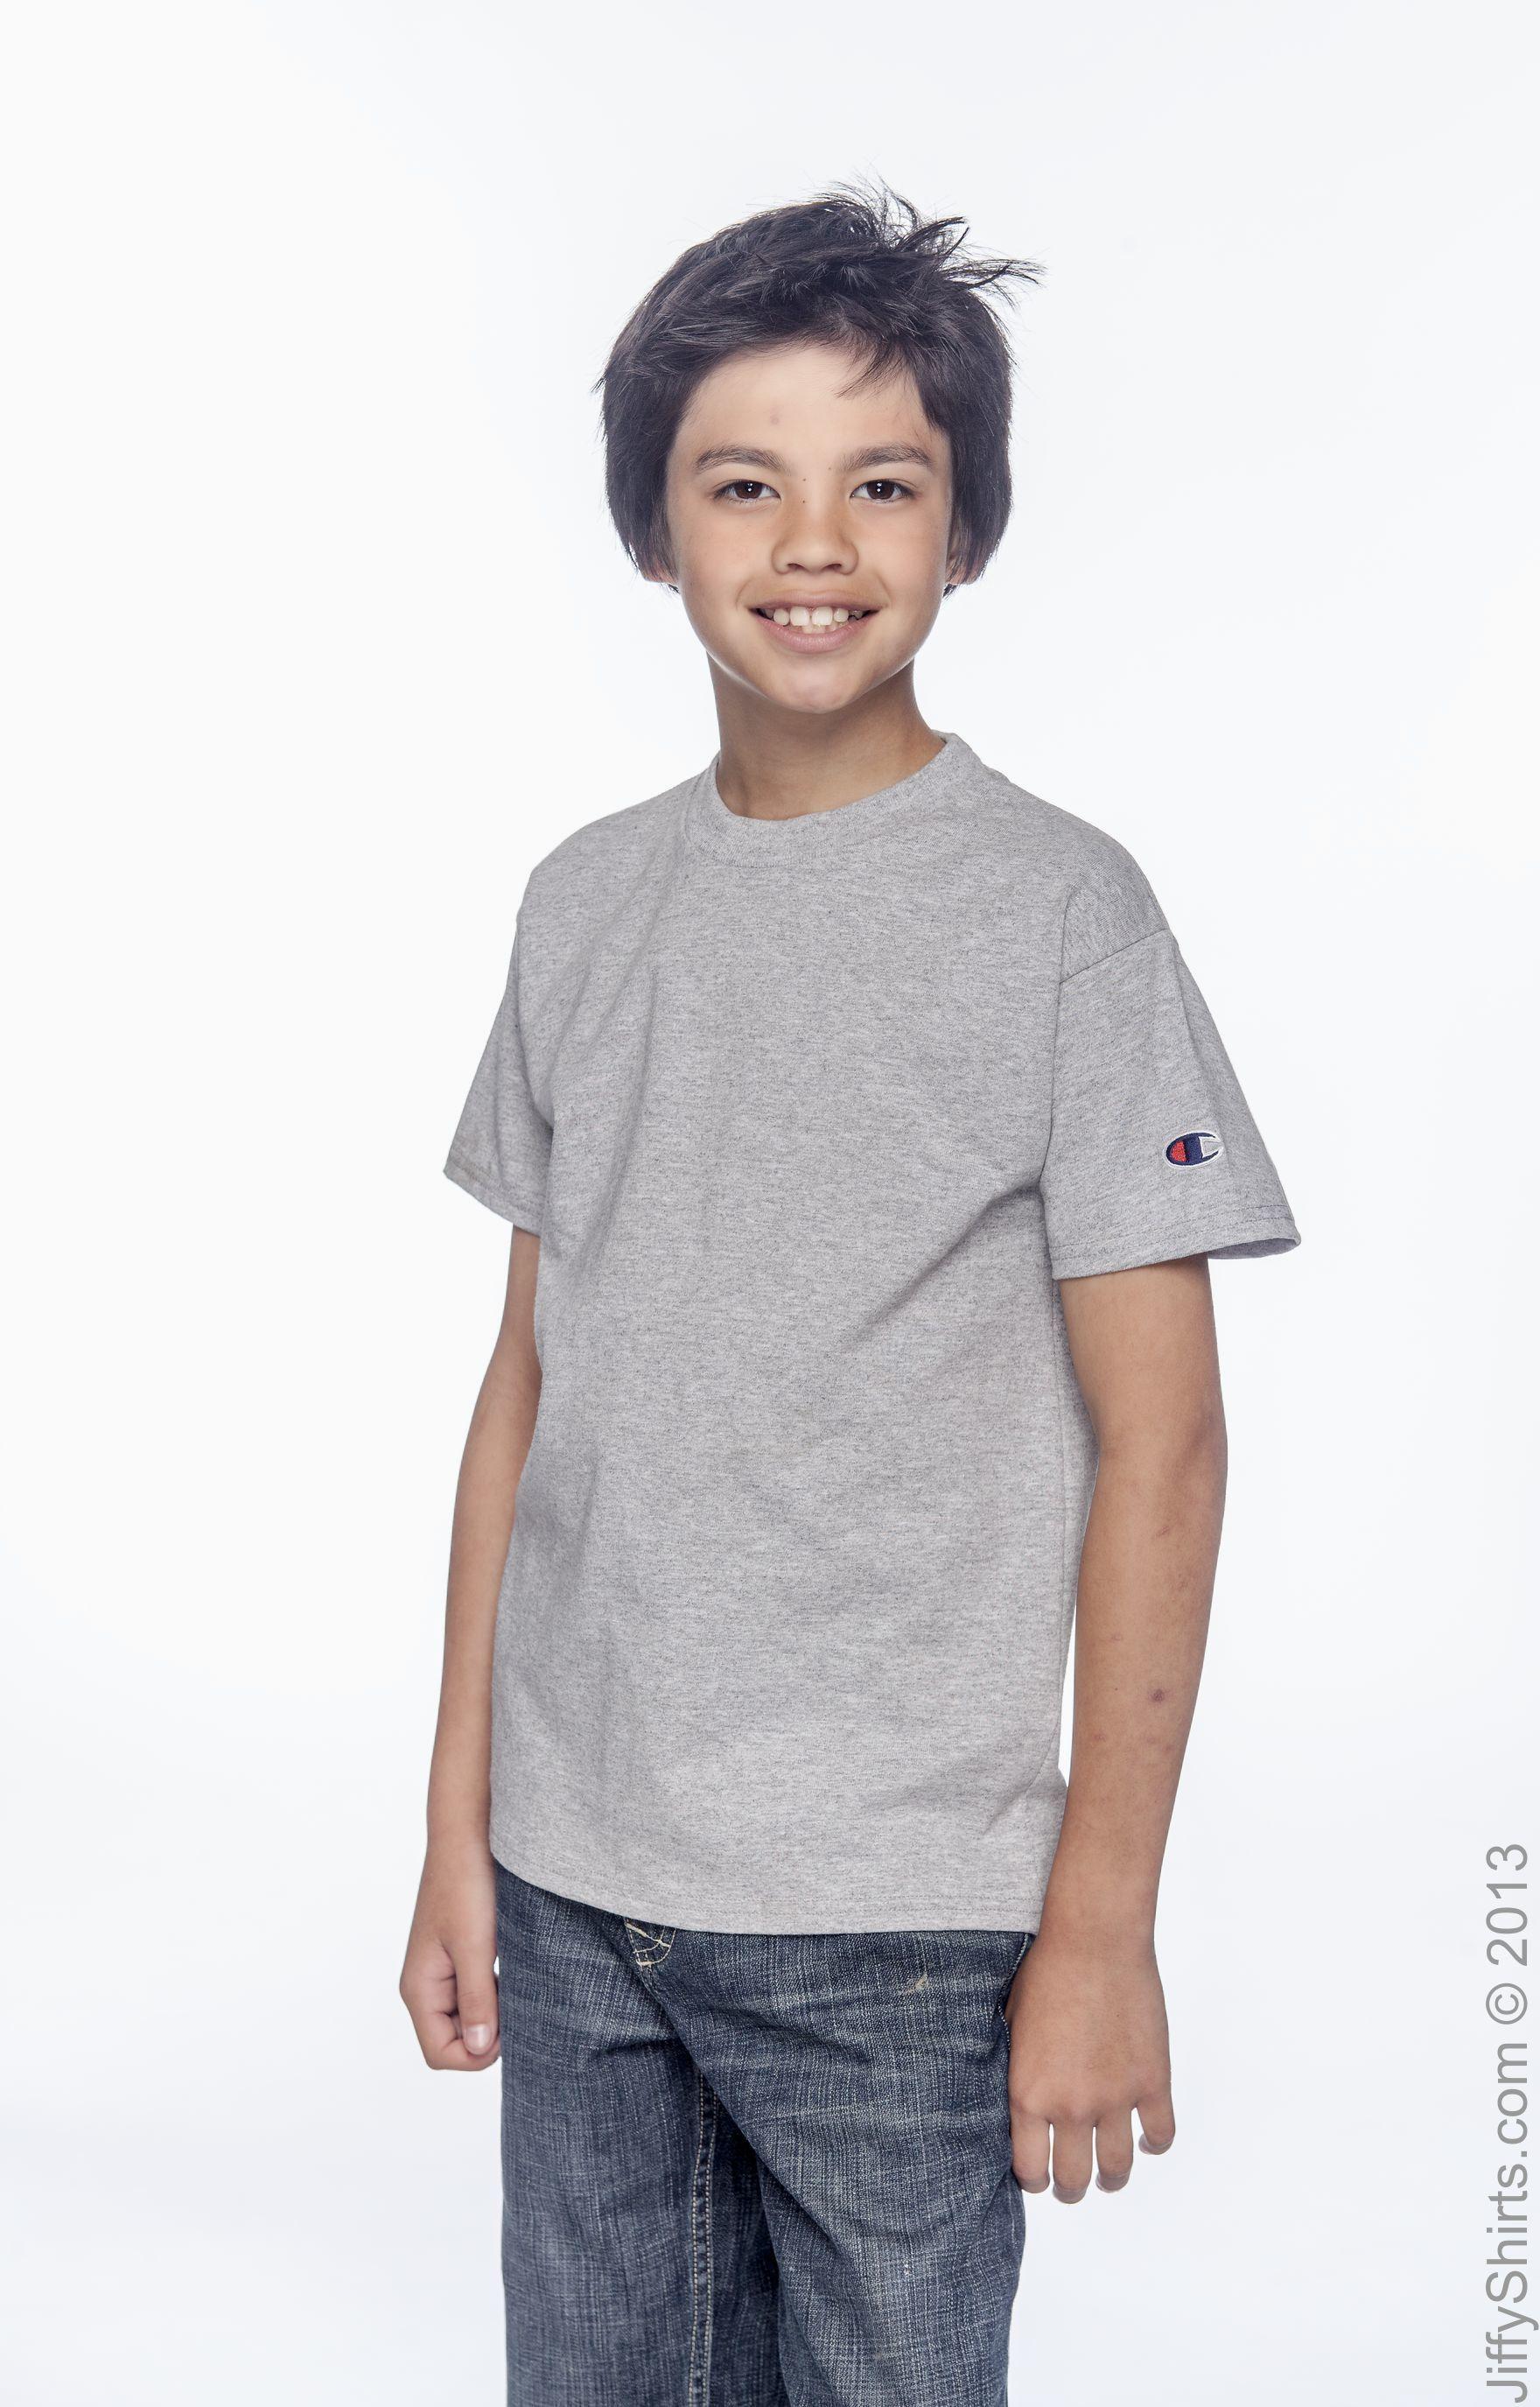 49c8459a Champion Youth 6.1 oz Short-Sleeve T-Shirt Champion T435 T-Shirts